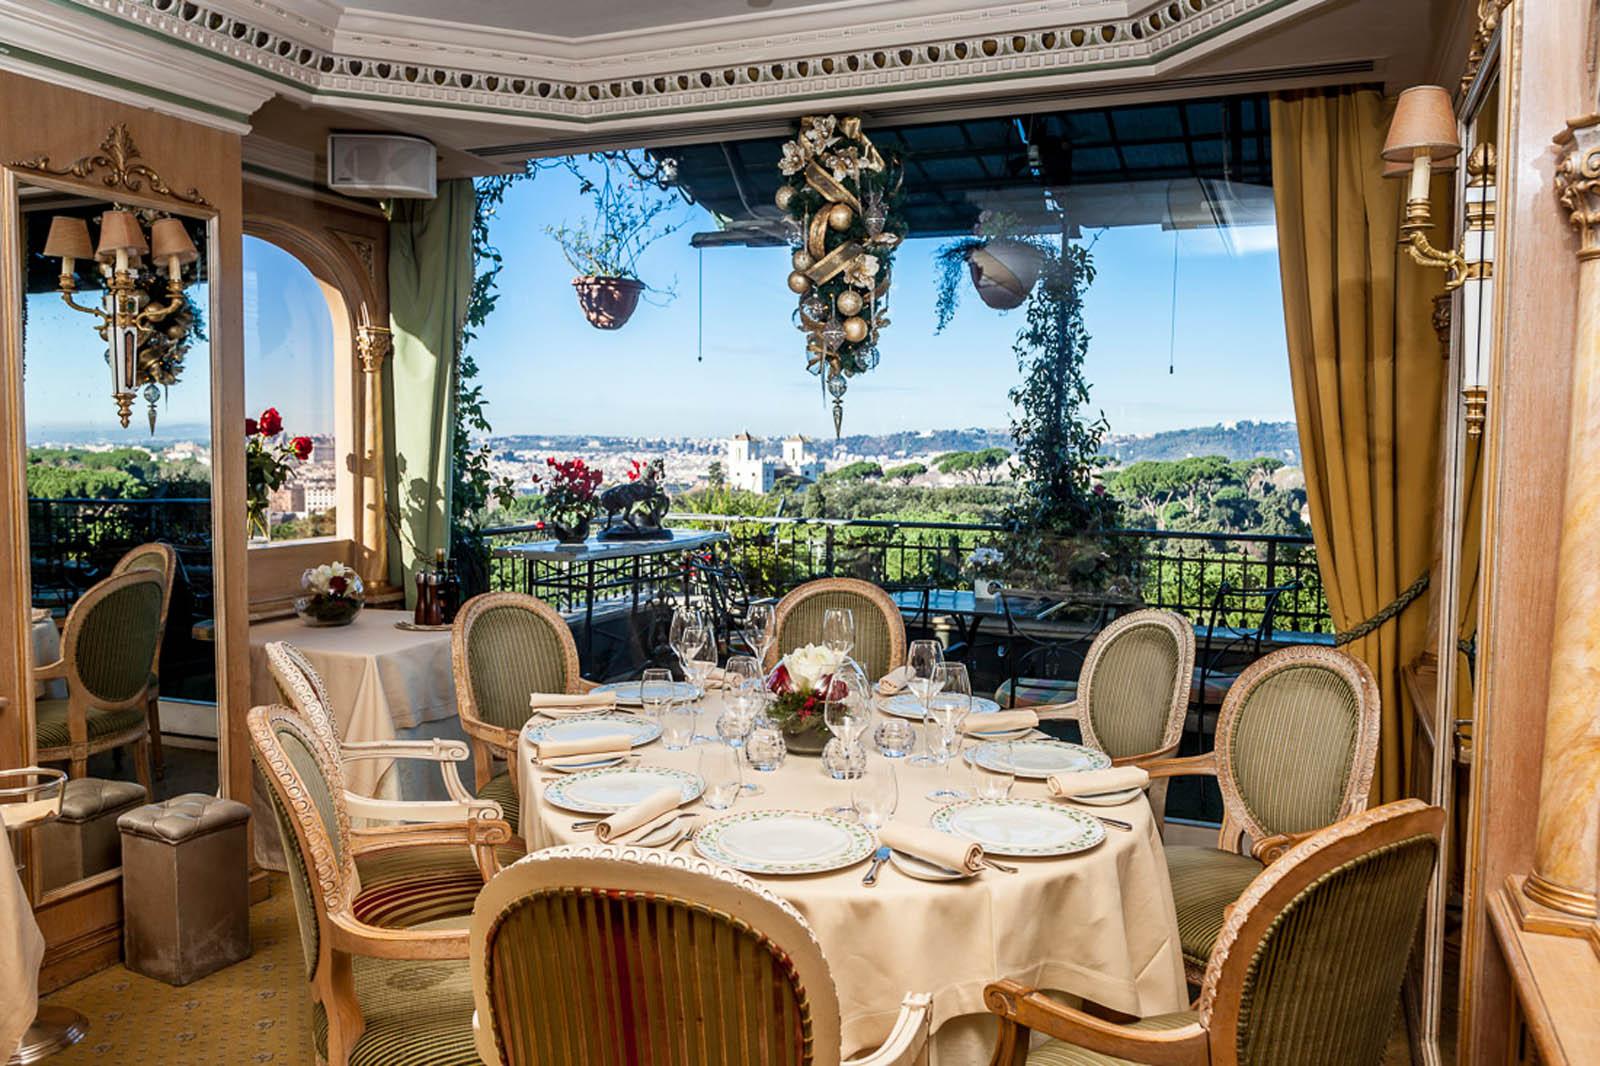 Restaurant villa fashion roth 55 best Boa Hancock images on Pinterest Boas, One piece and